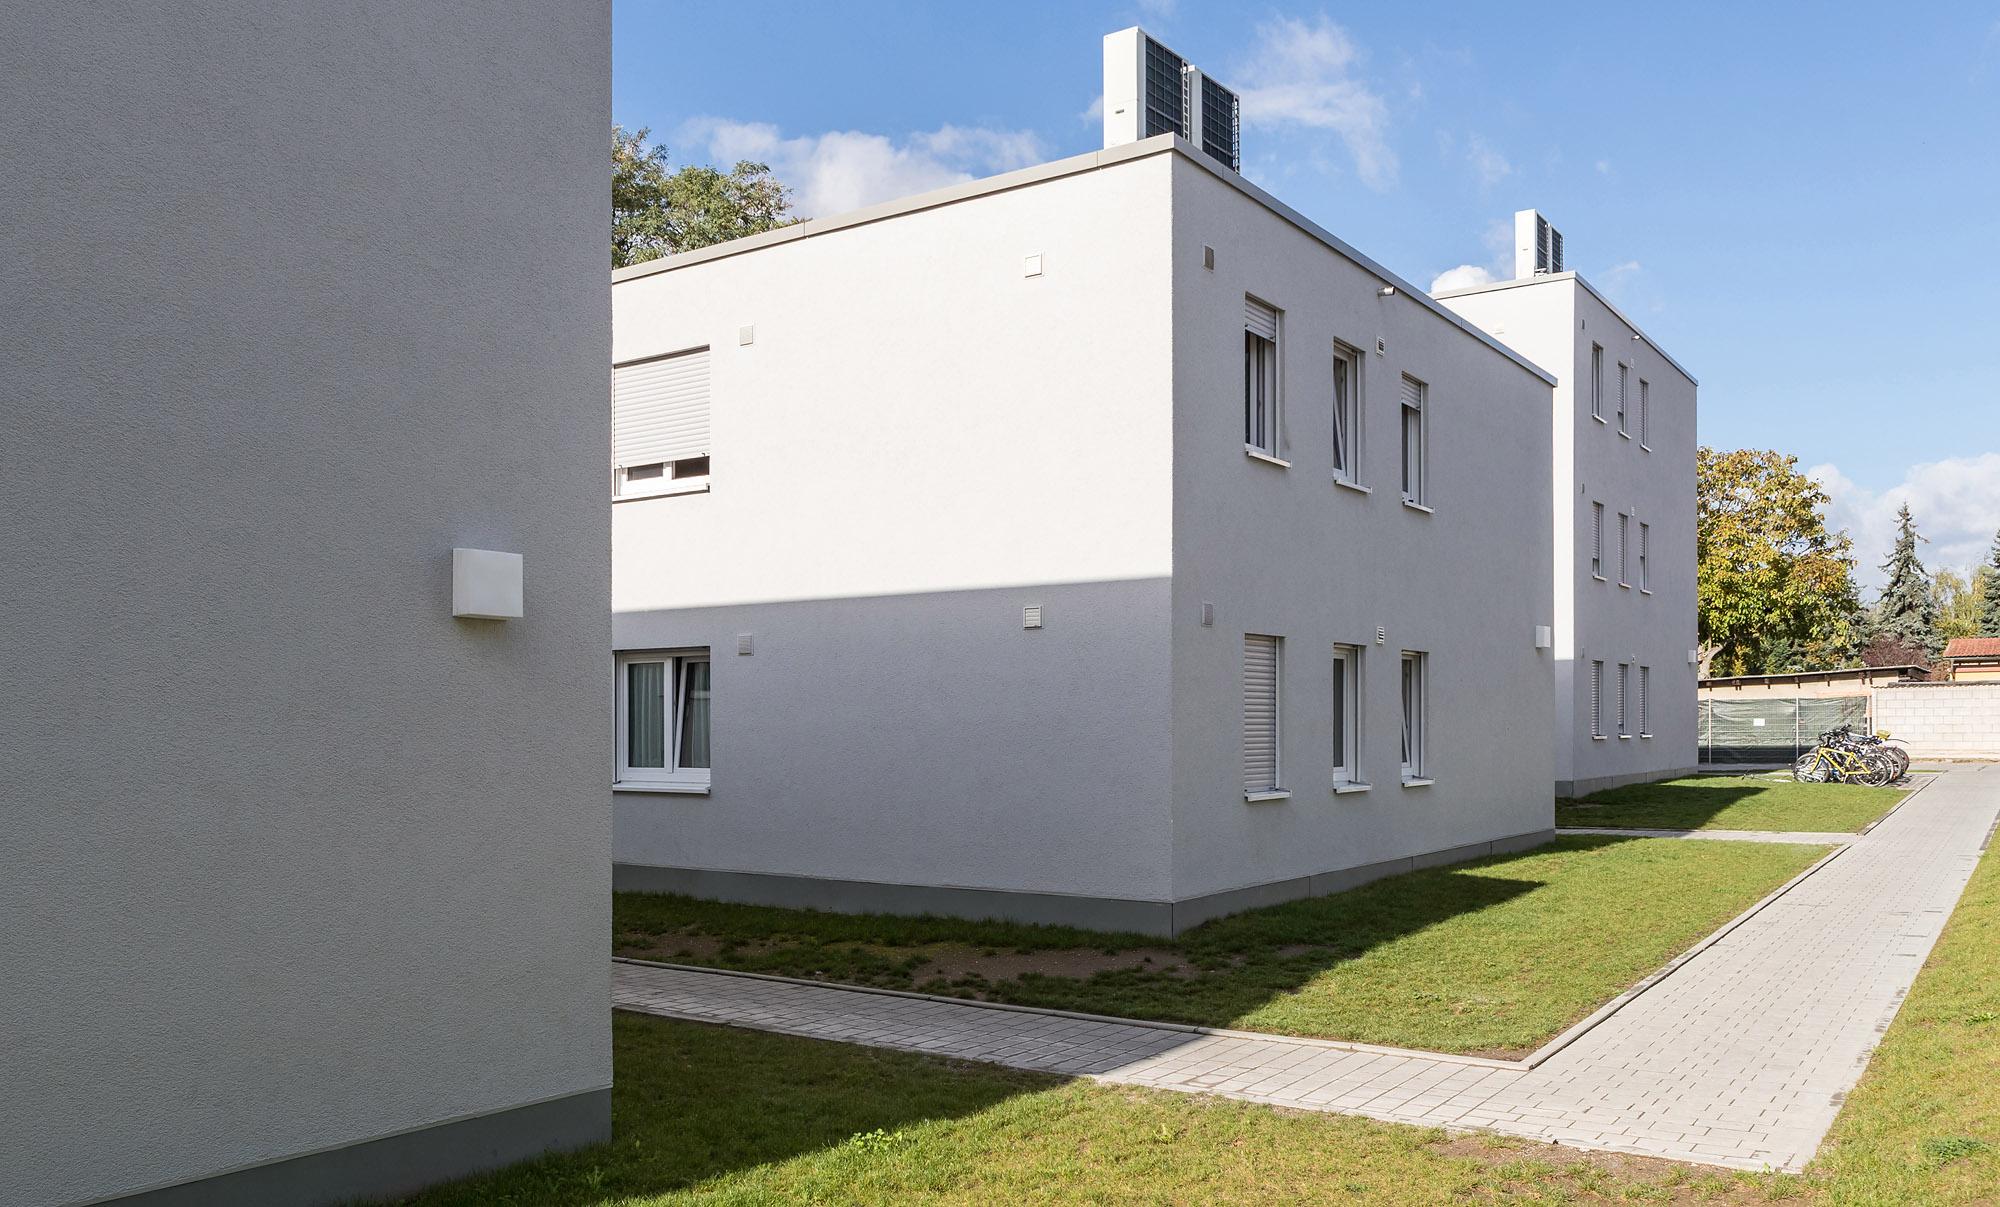 Flüchtlingswohnheim Bensheim